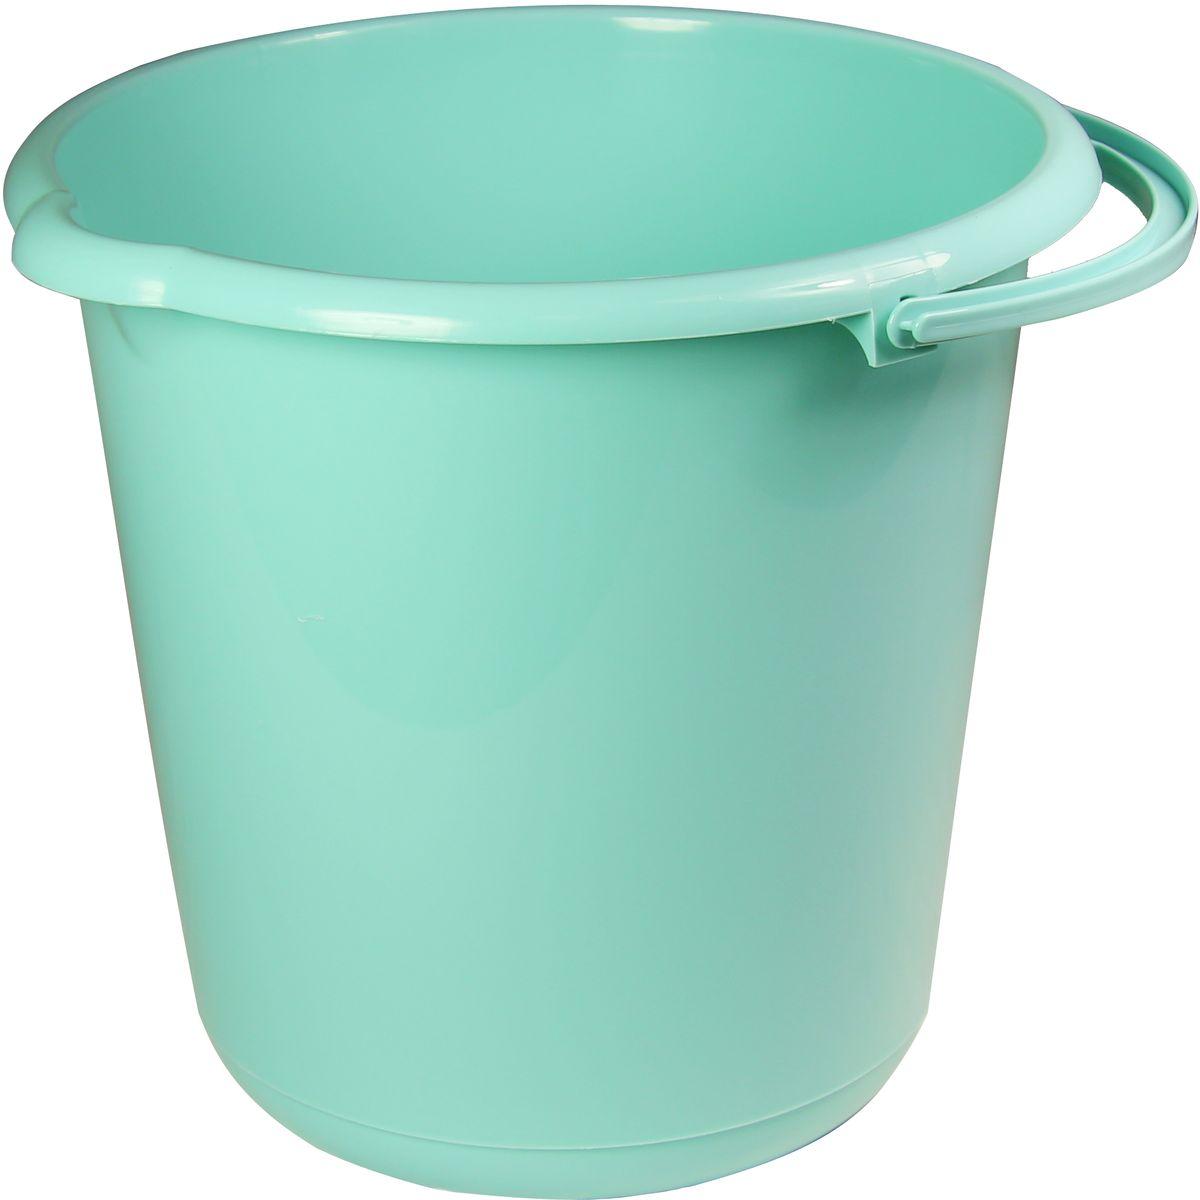 Ведро Idea, цвет: аквамарин, 5 л ведро хозяйственное idea цвет аквамарин 3 л м 2428